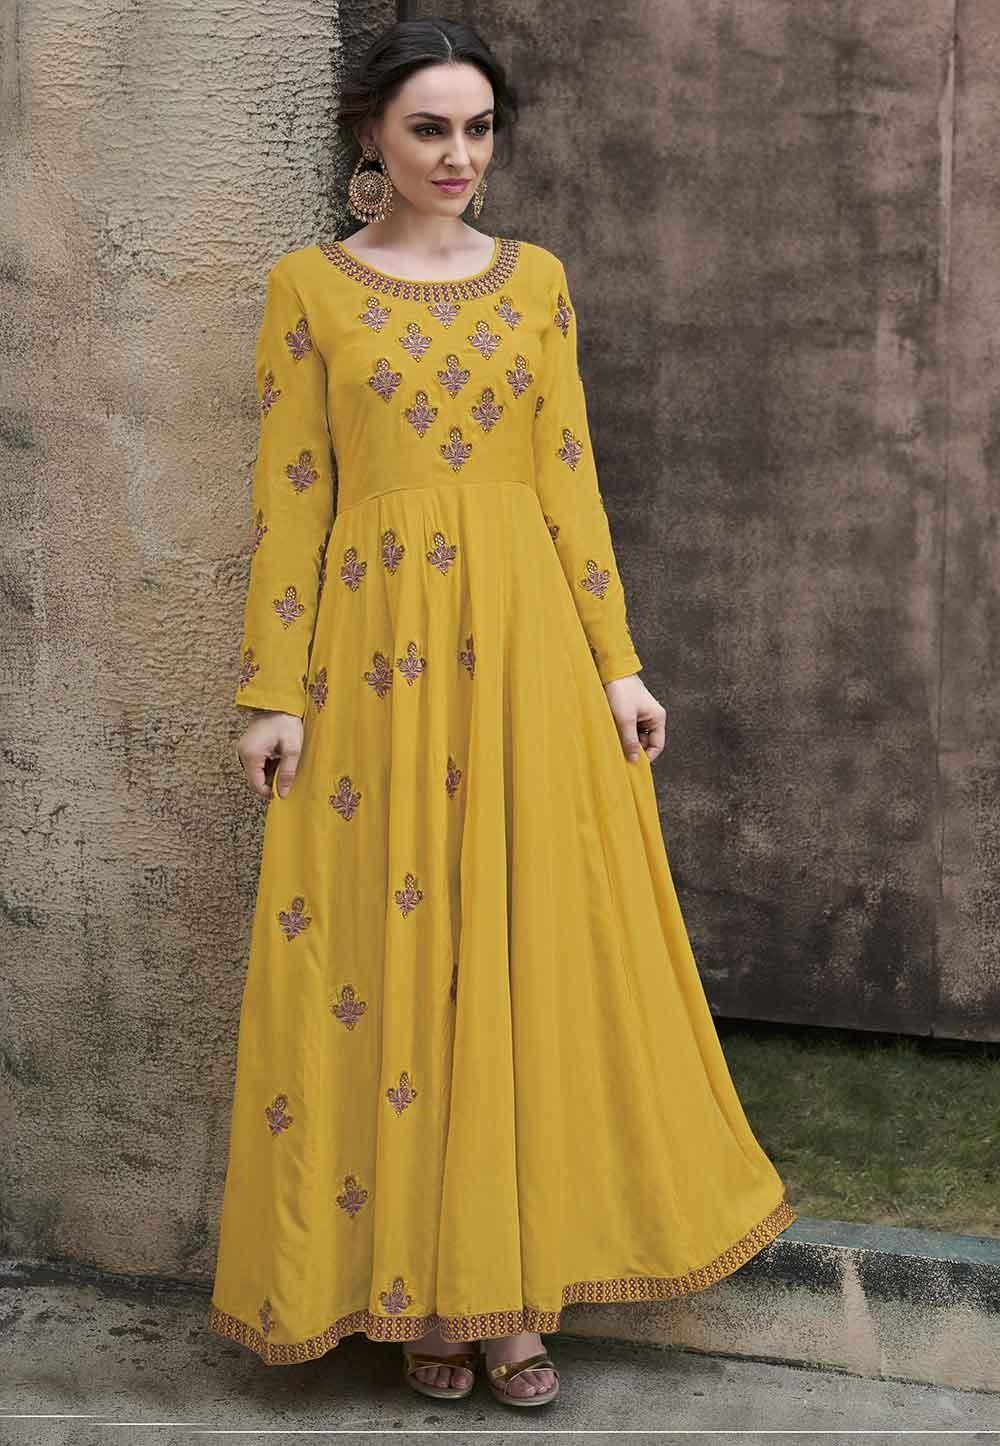 Party Wear Saree Yellow Colour.